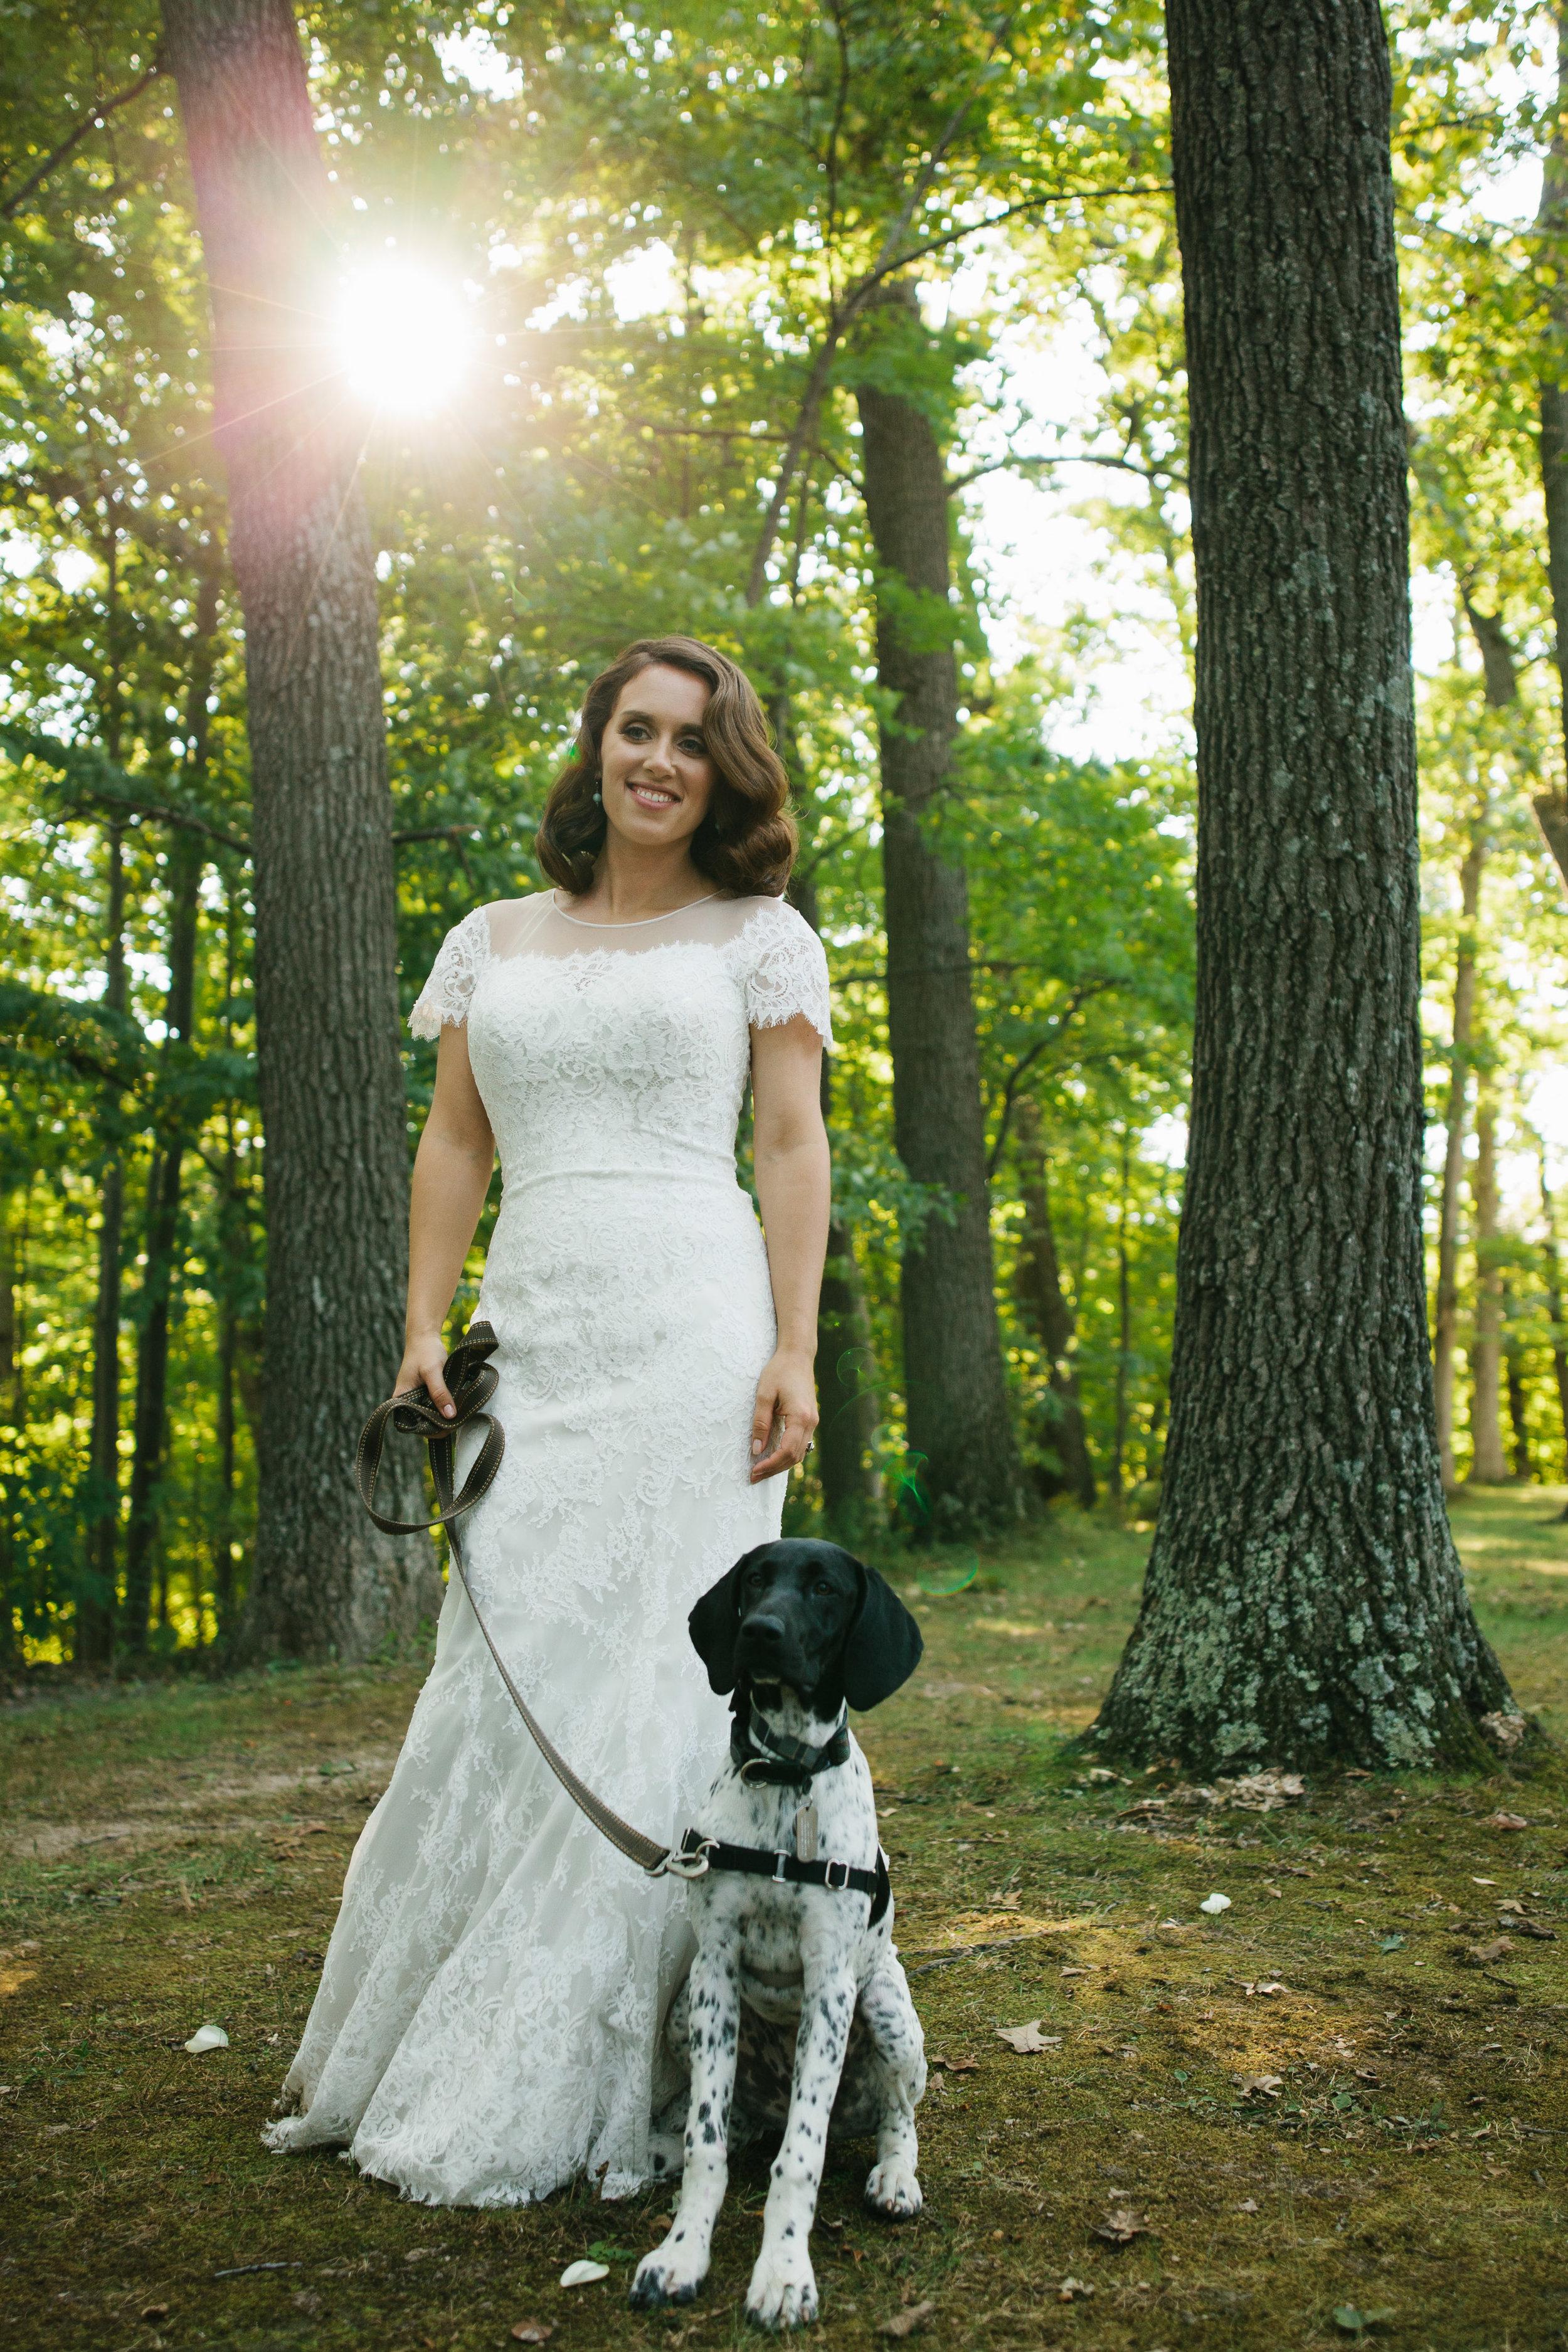 grand_rapids_wedding_rockford_wedding_richard_app_gallery_wedding_grand_rapids_wedding_photographer_summer_wedding_wabasis_lake_park_wedding_rustic_wedding-49.jpg